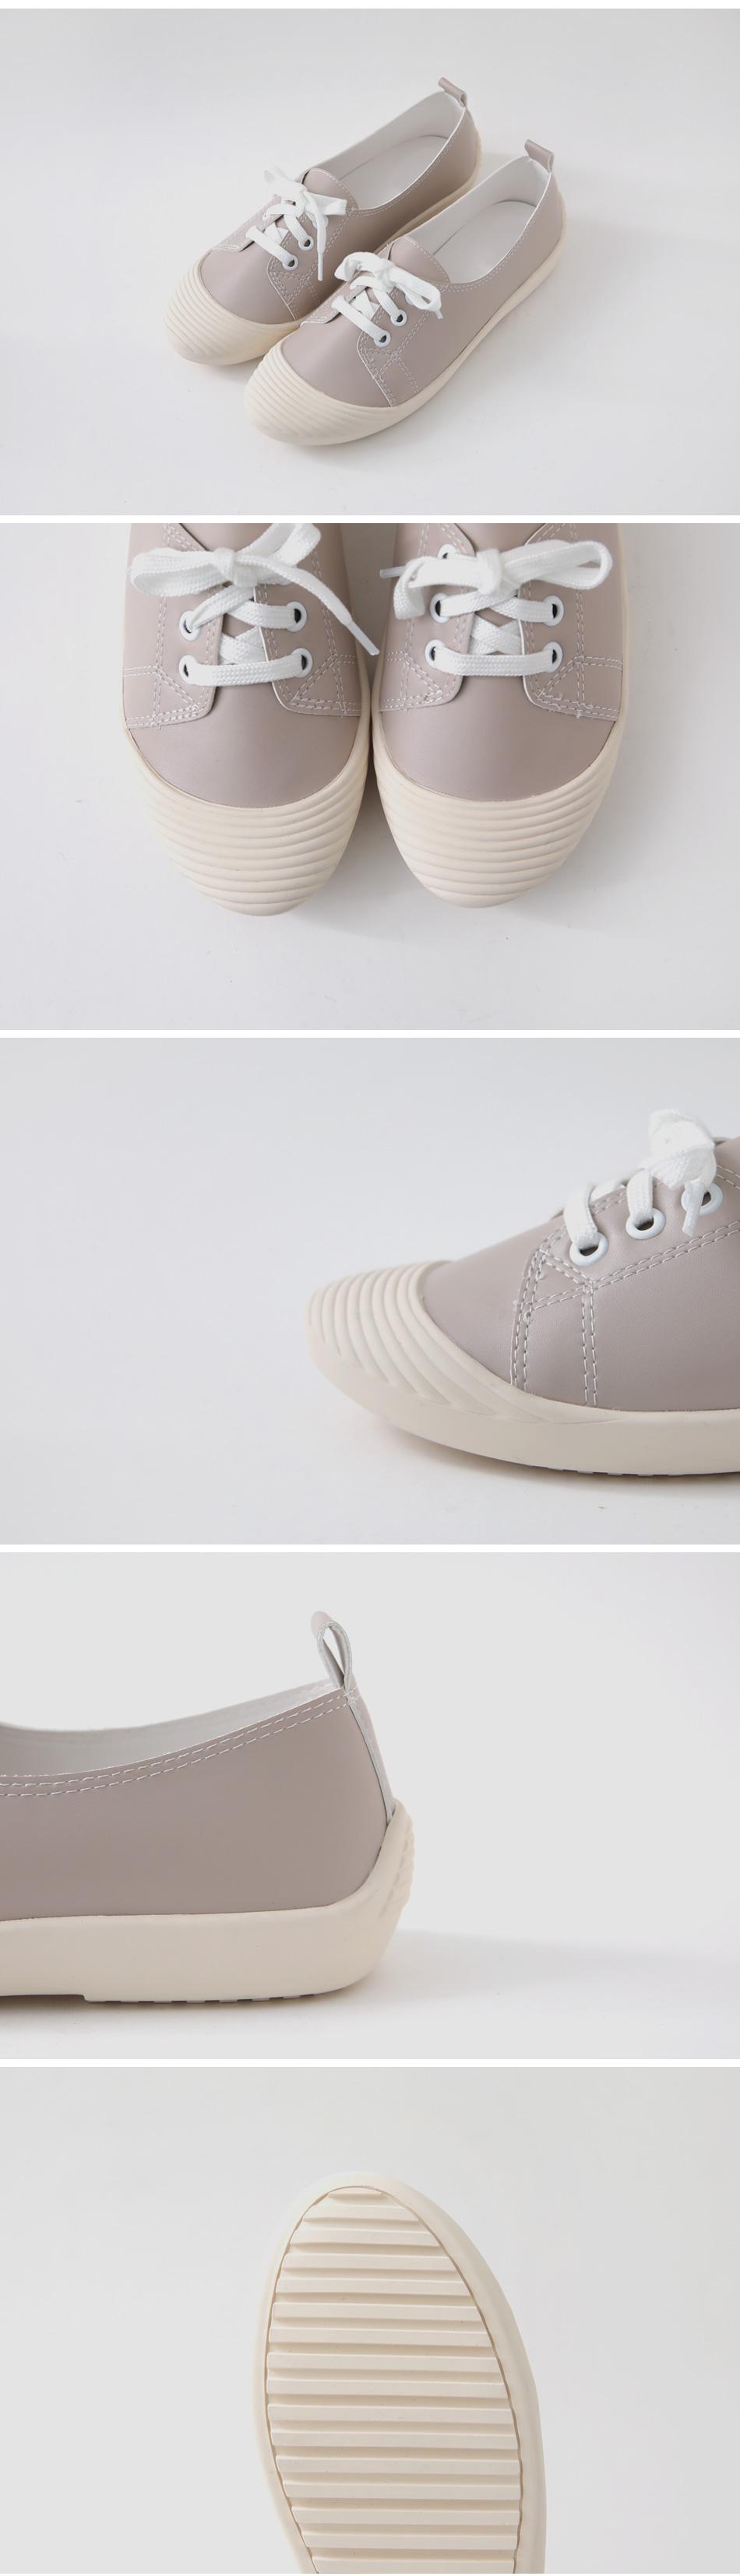 Sewer sneaker 2.5cm